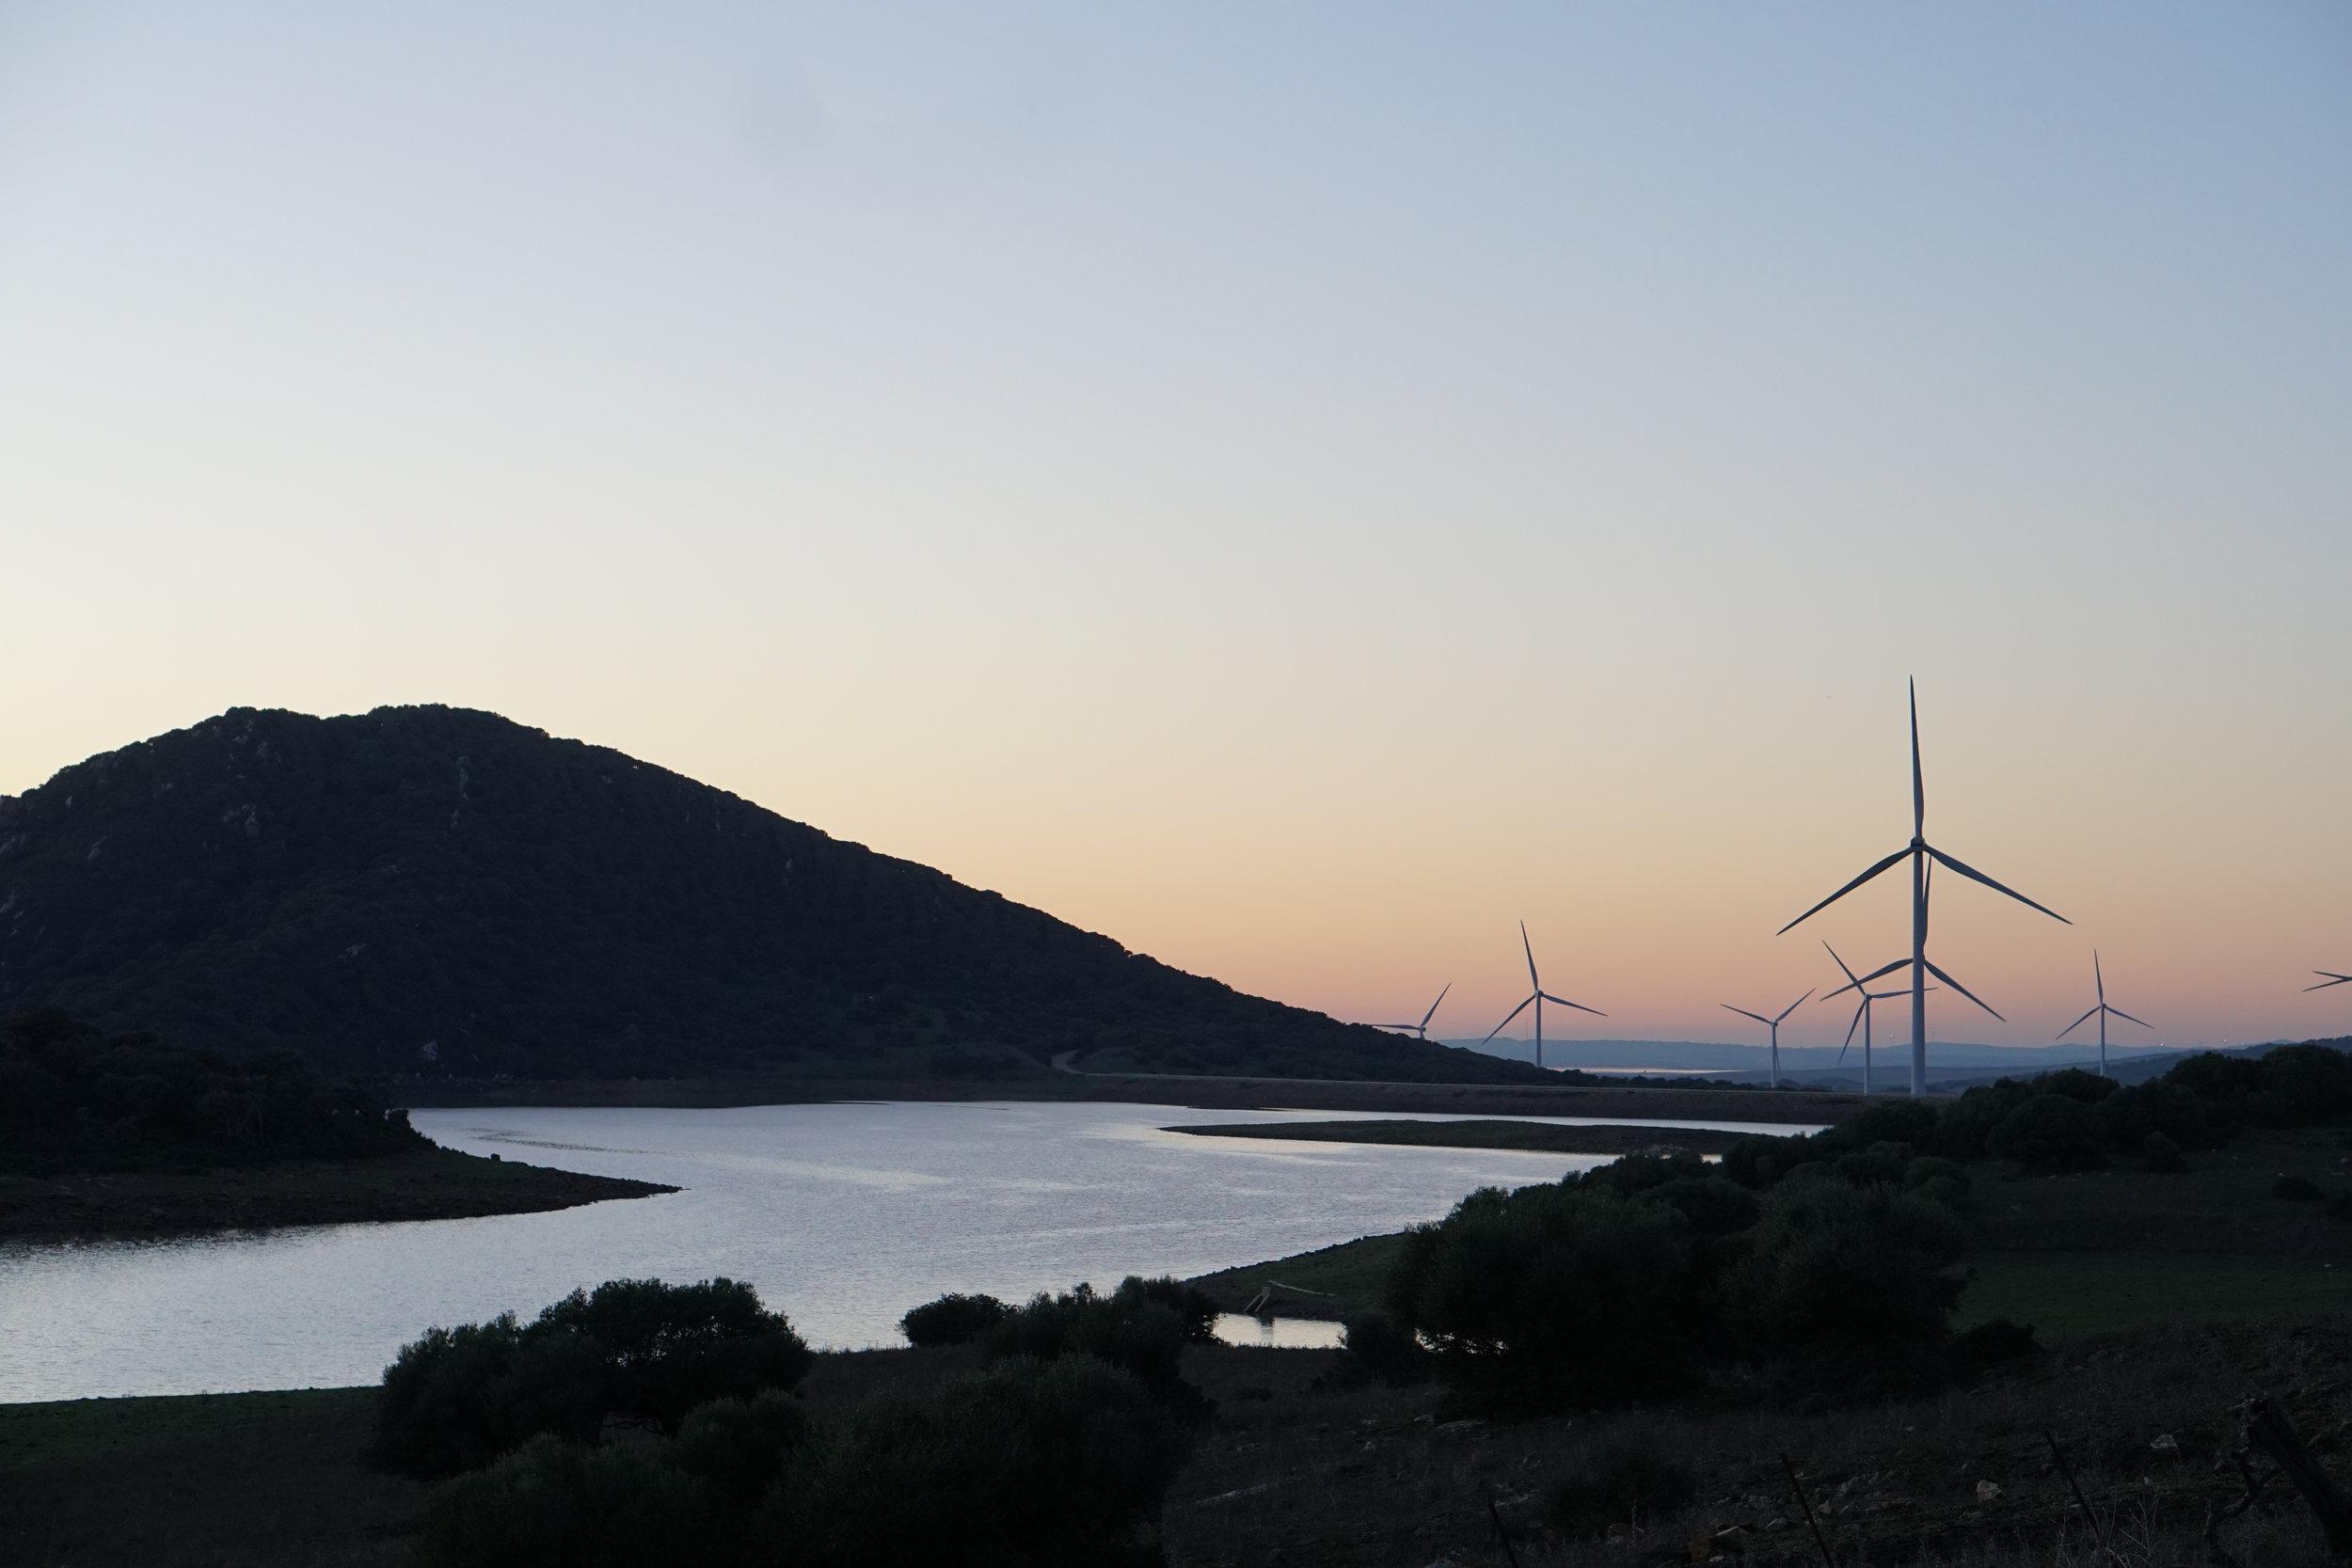 Valle de Ojen turbines